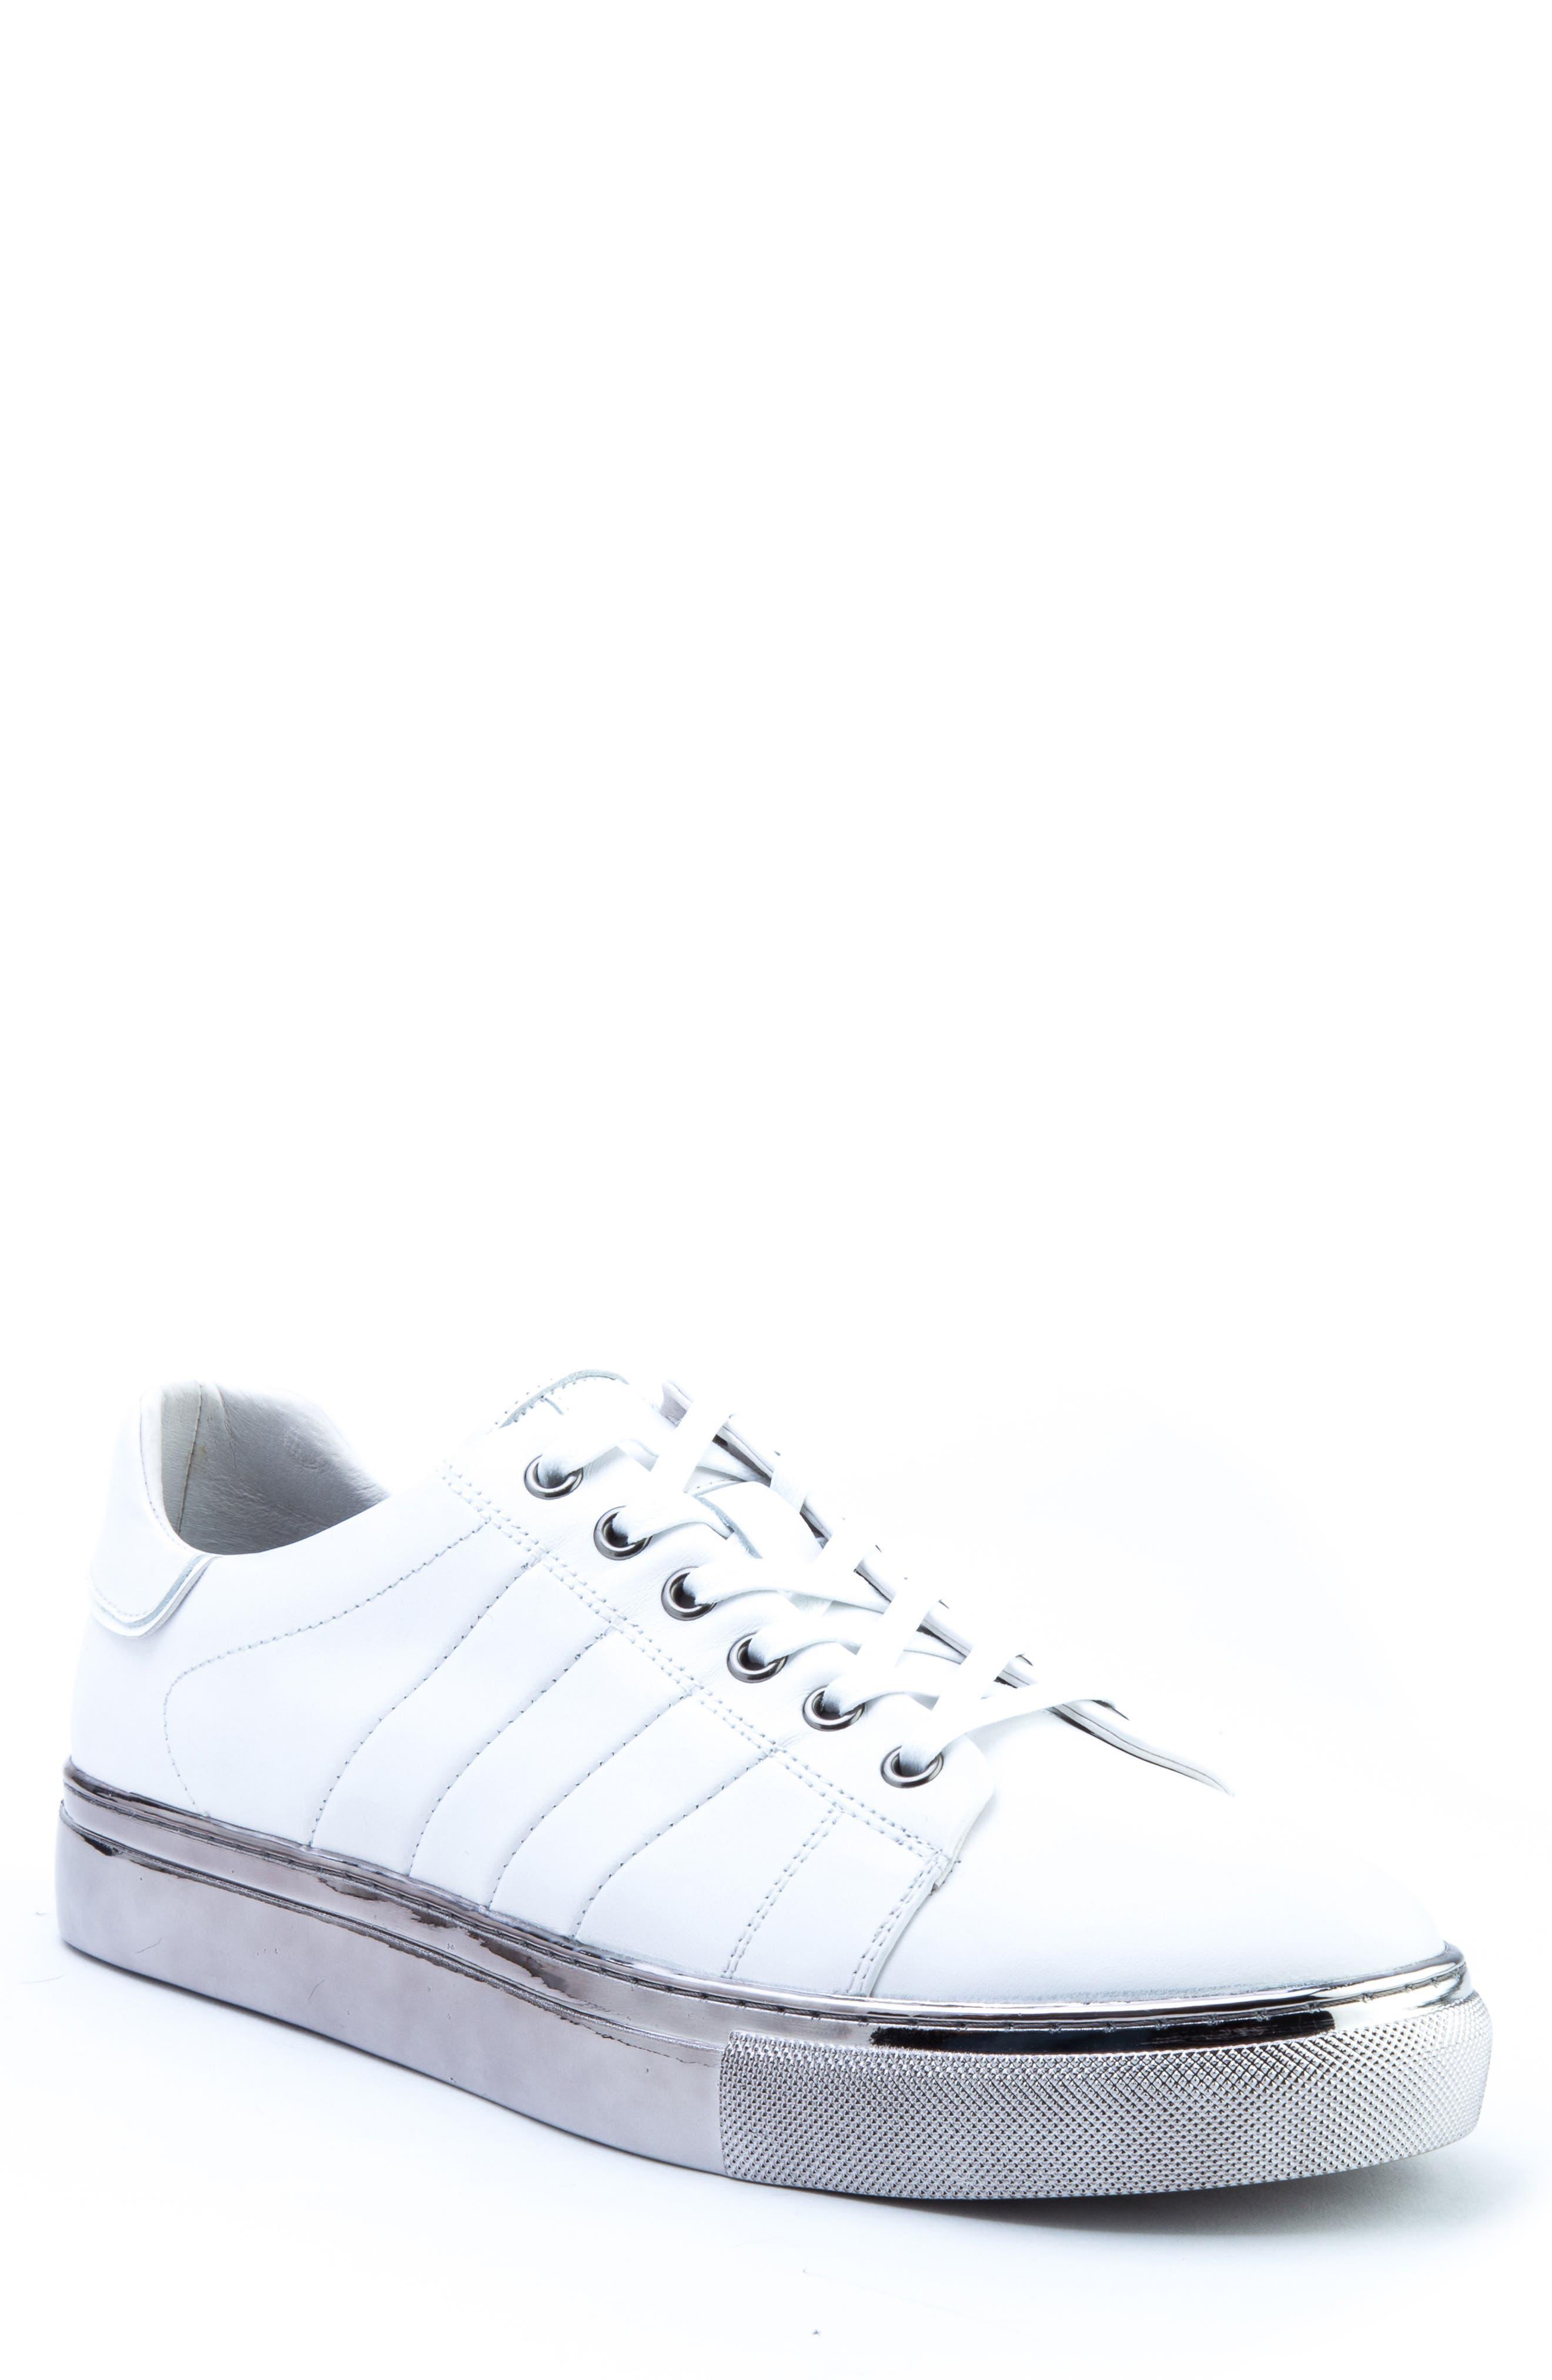 Badgley Mischka Brando Sneaker- White